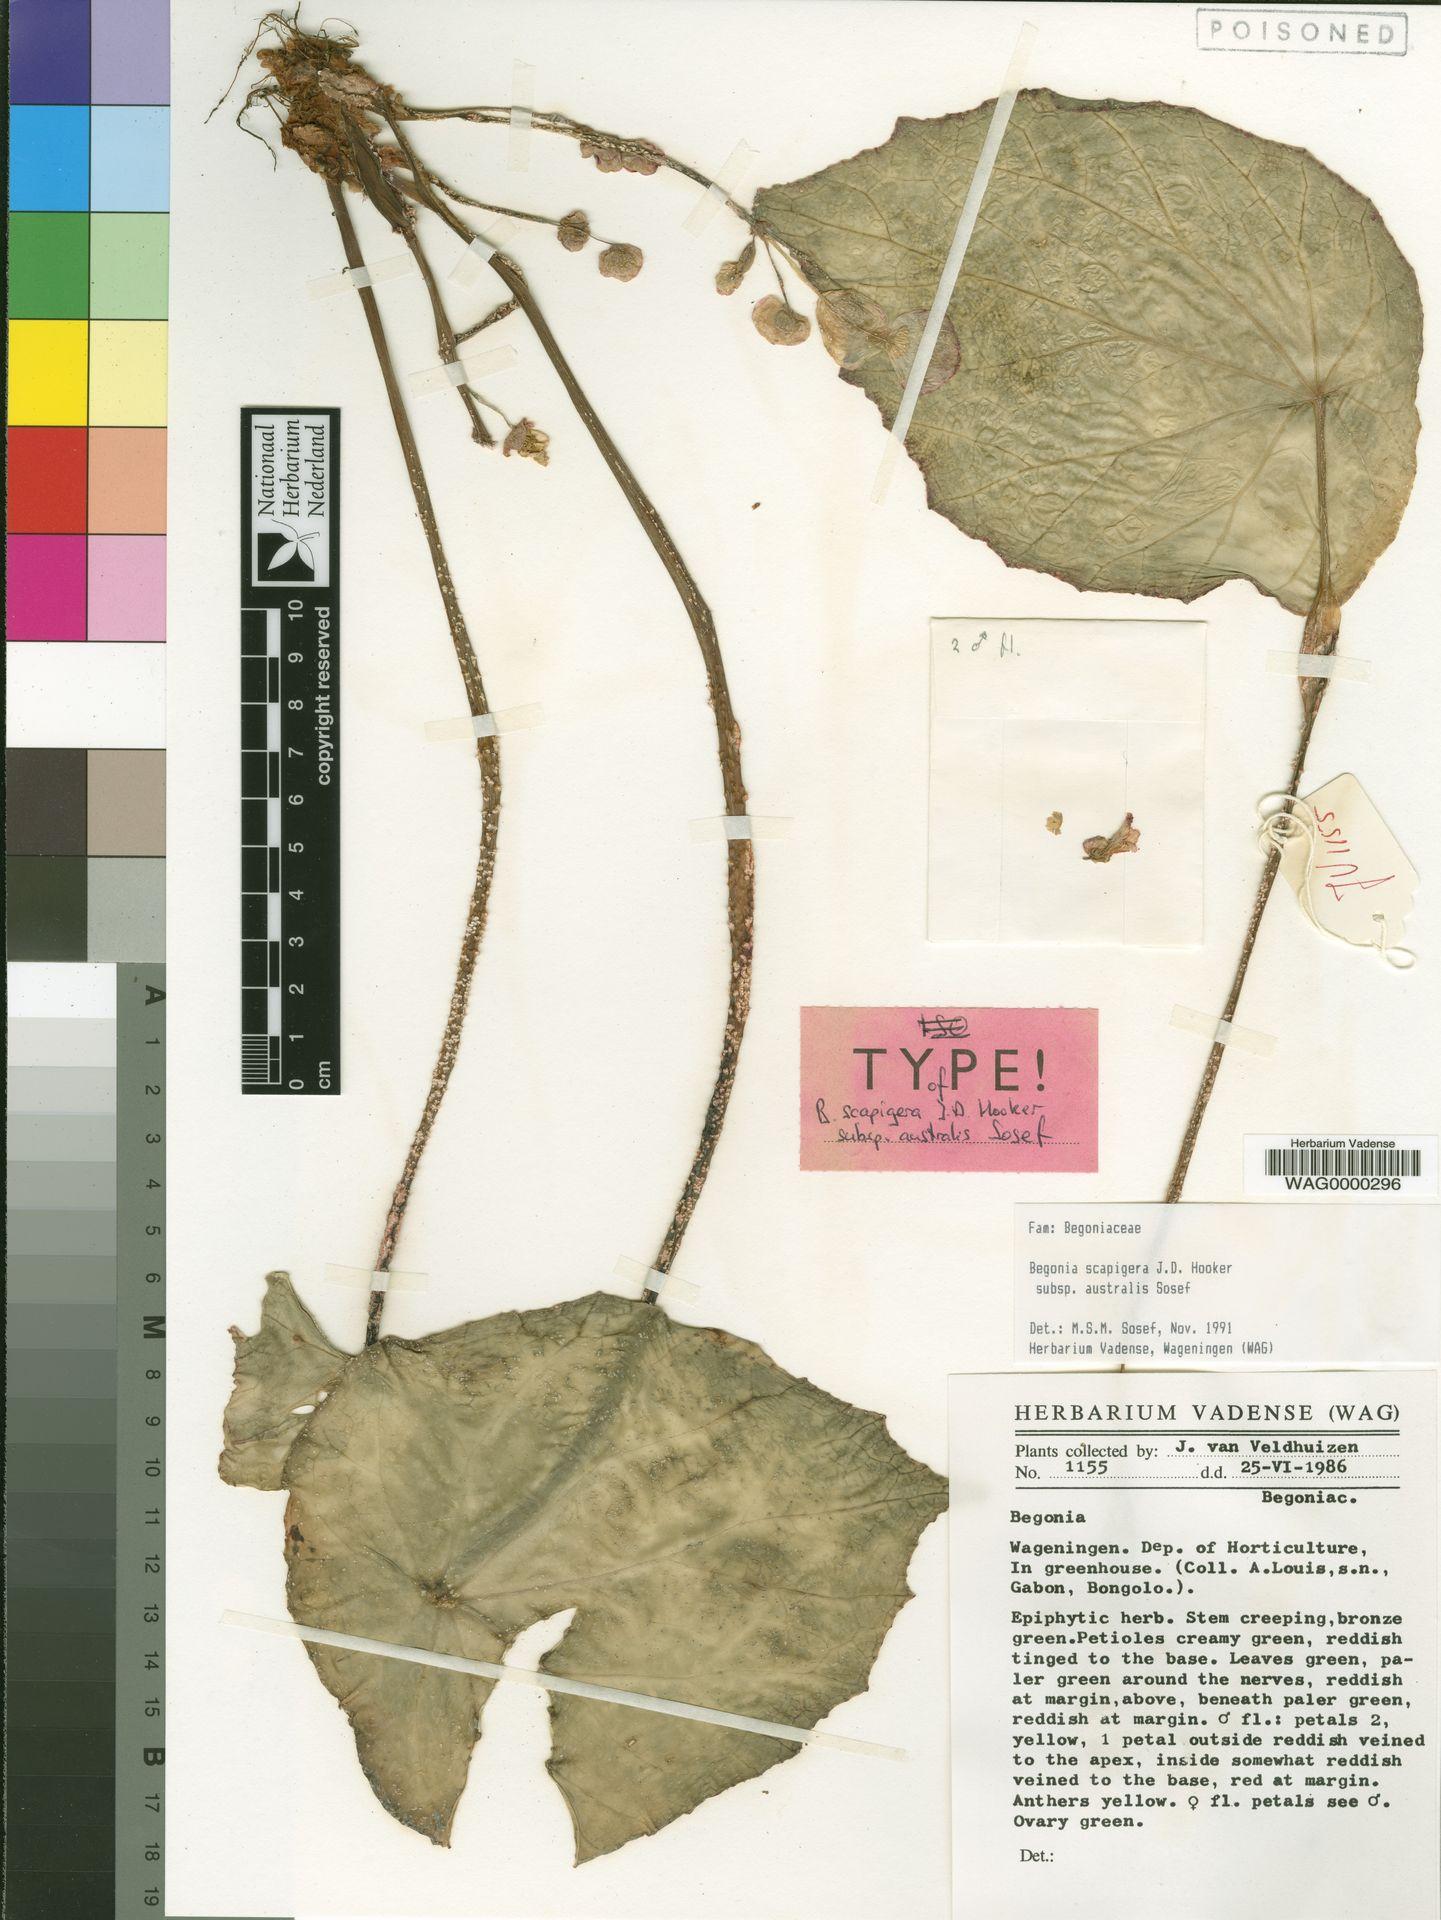 WAG0000296   Begonia scapigera subsp. australis Sosef